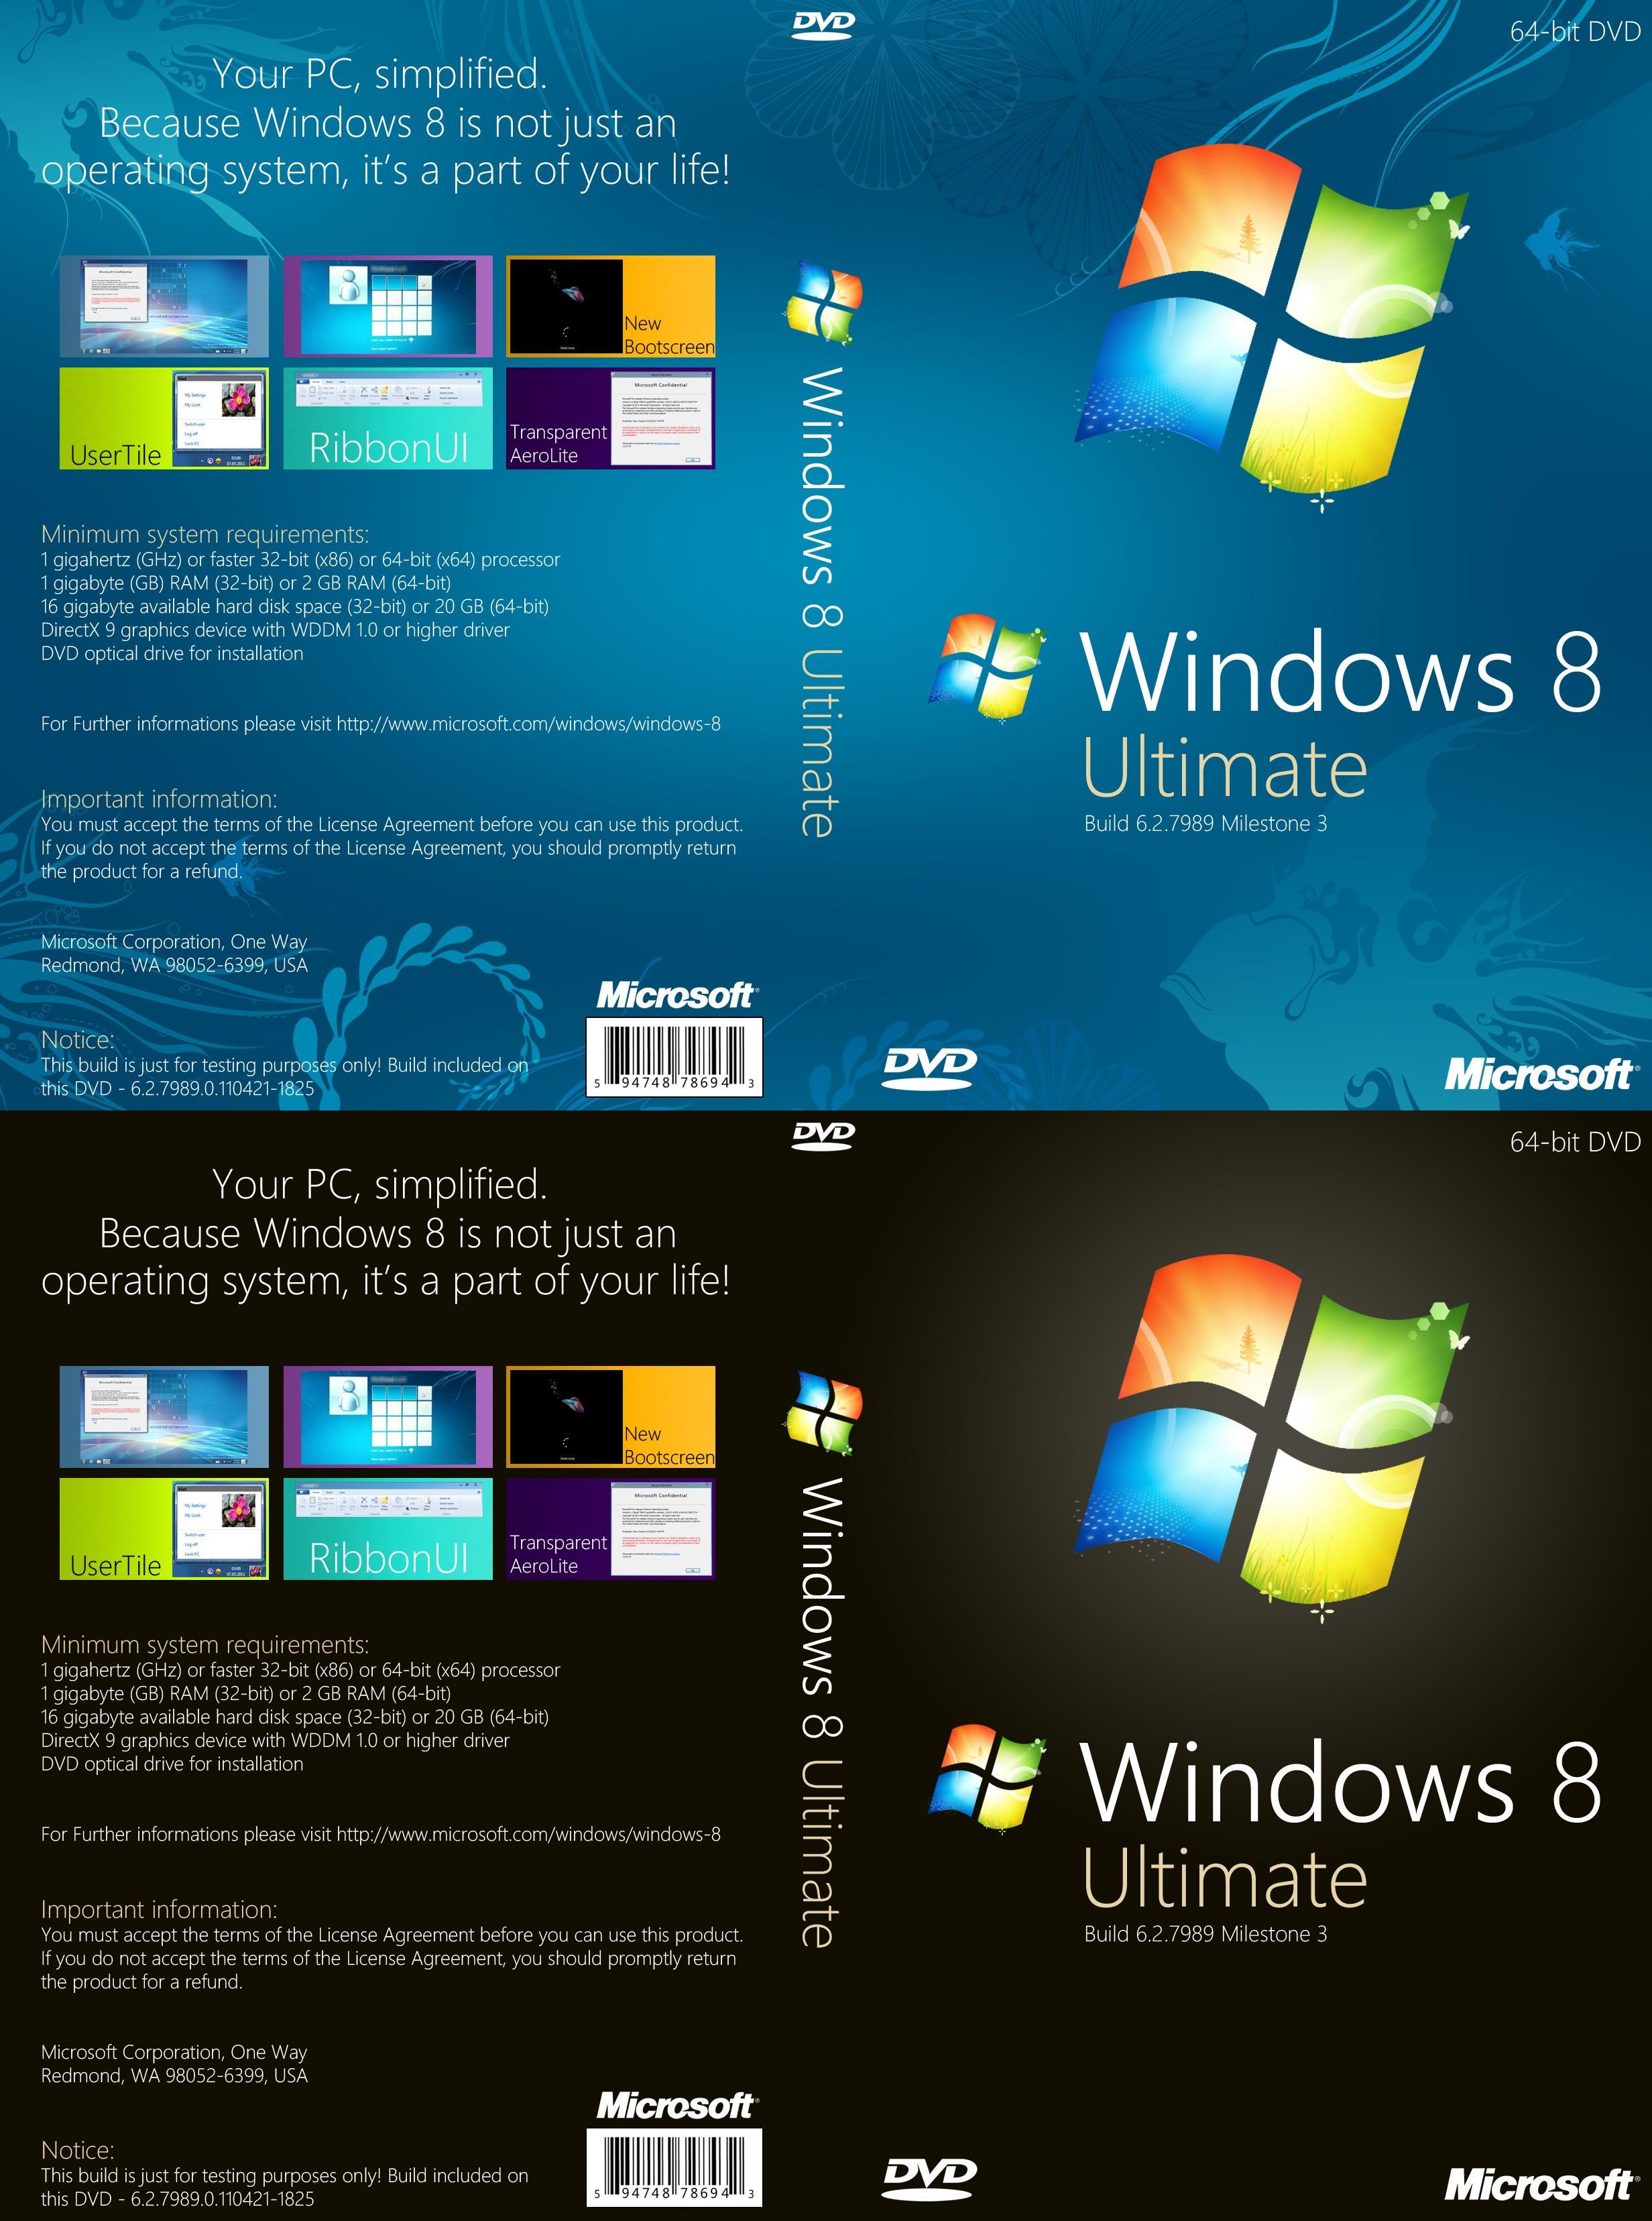 Windows 7 Ultimate Product Key 32 Bit Free Download 2015